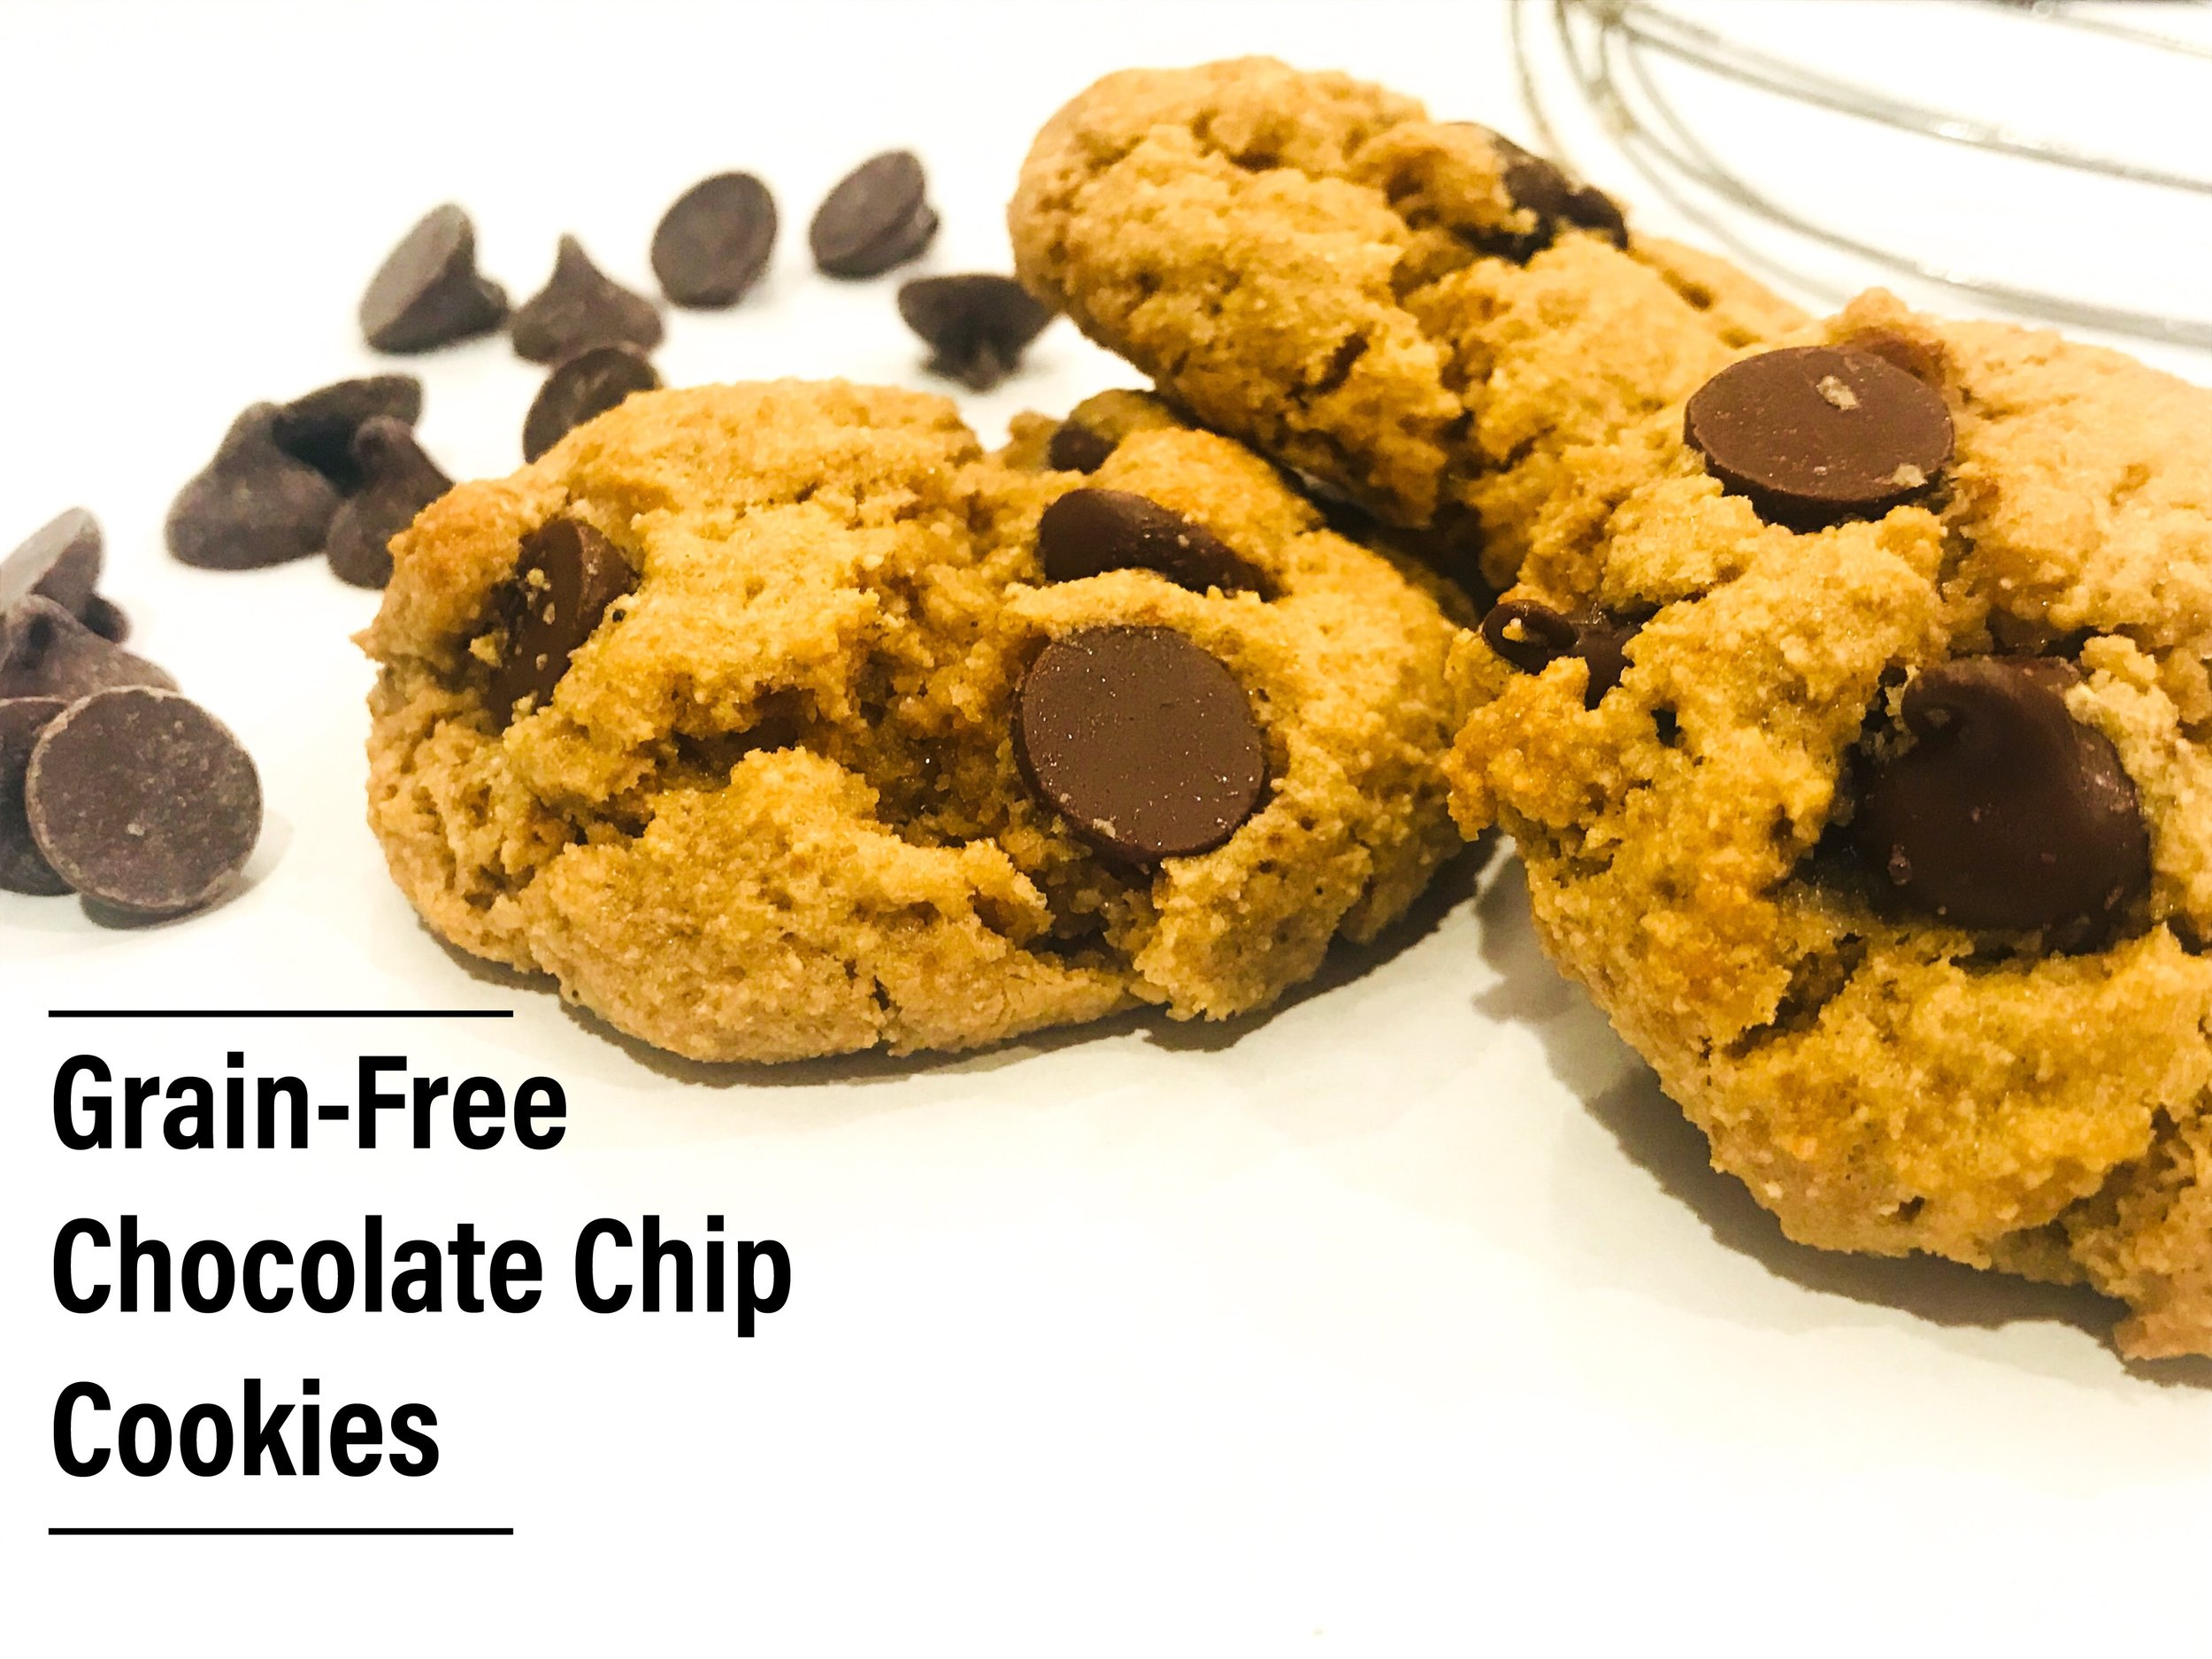 grainfreechocchipcookies.JPEG